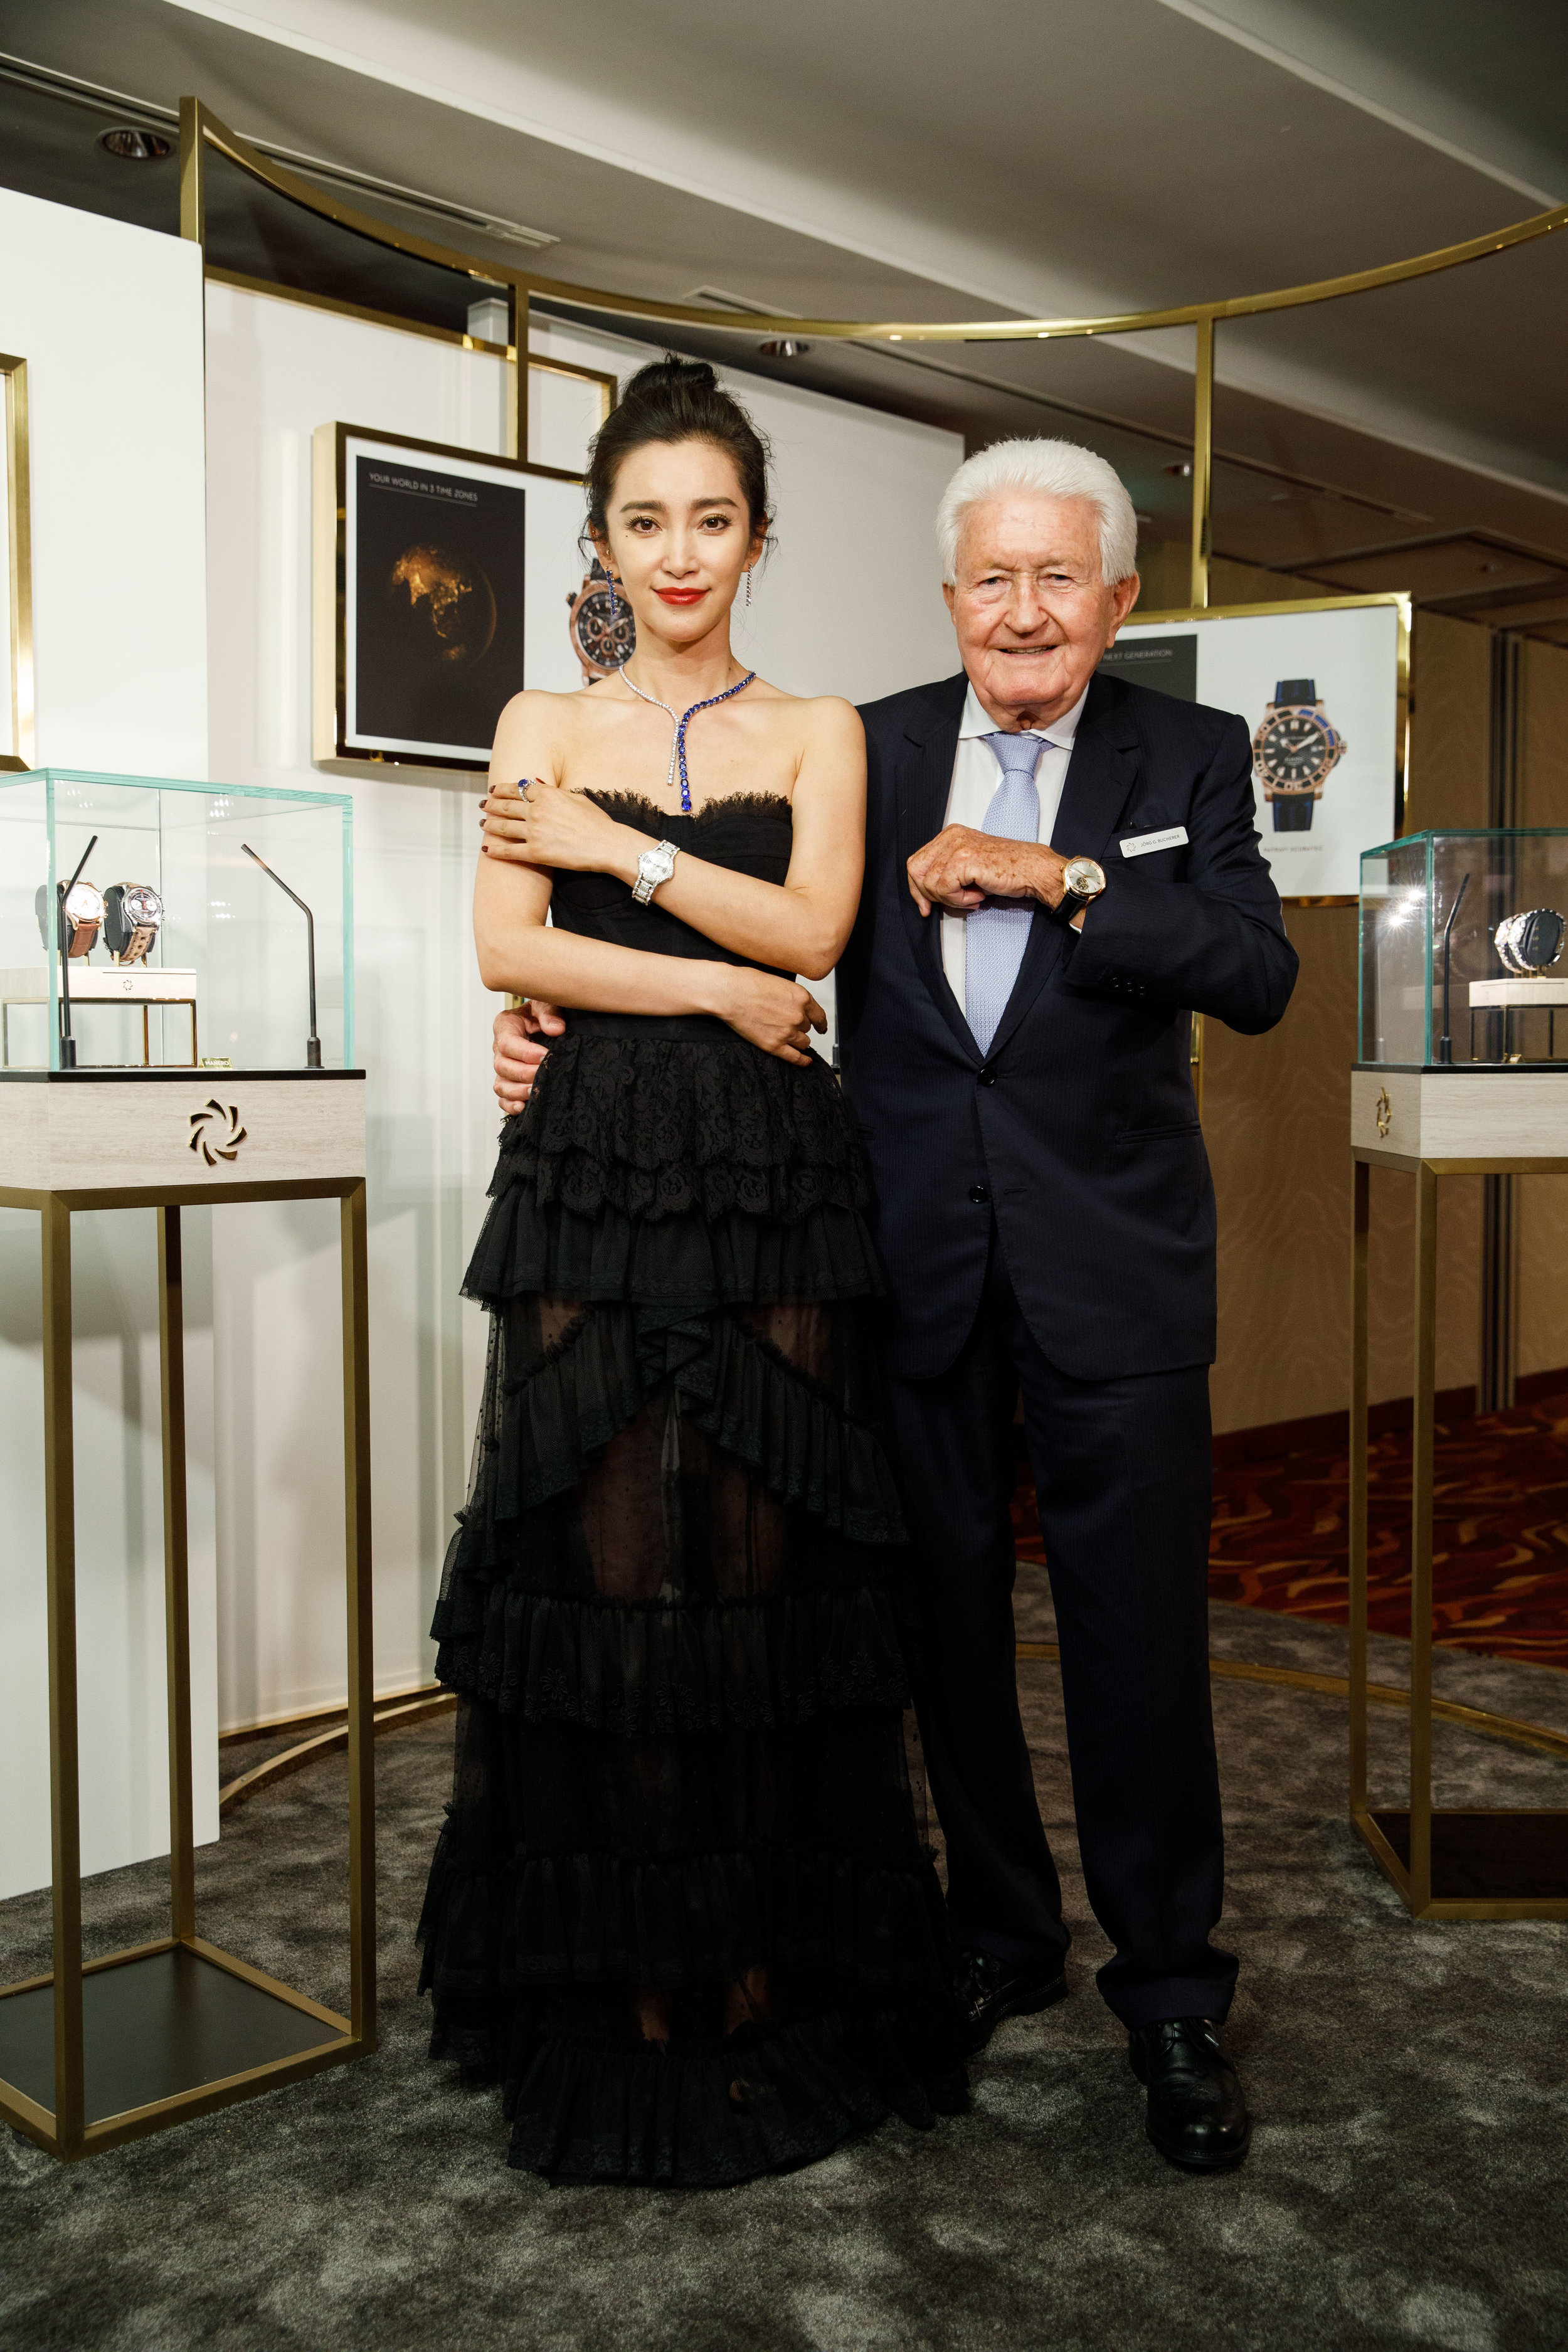 Li BingBing and Jörg G. Bucherer. Carl F. Bucherer 'Distinct Moment'. Hong Kong. 2018